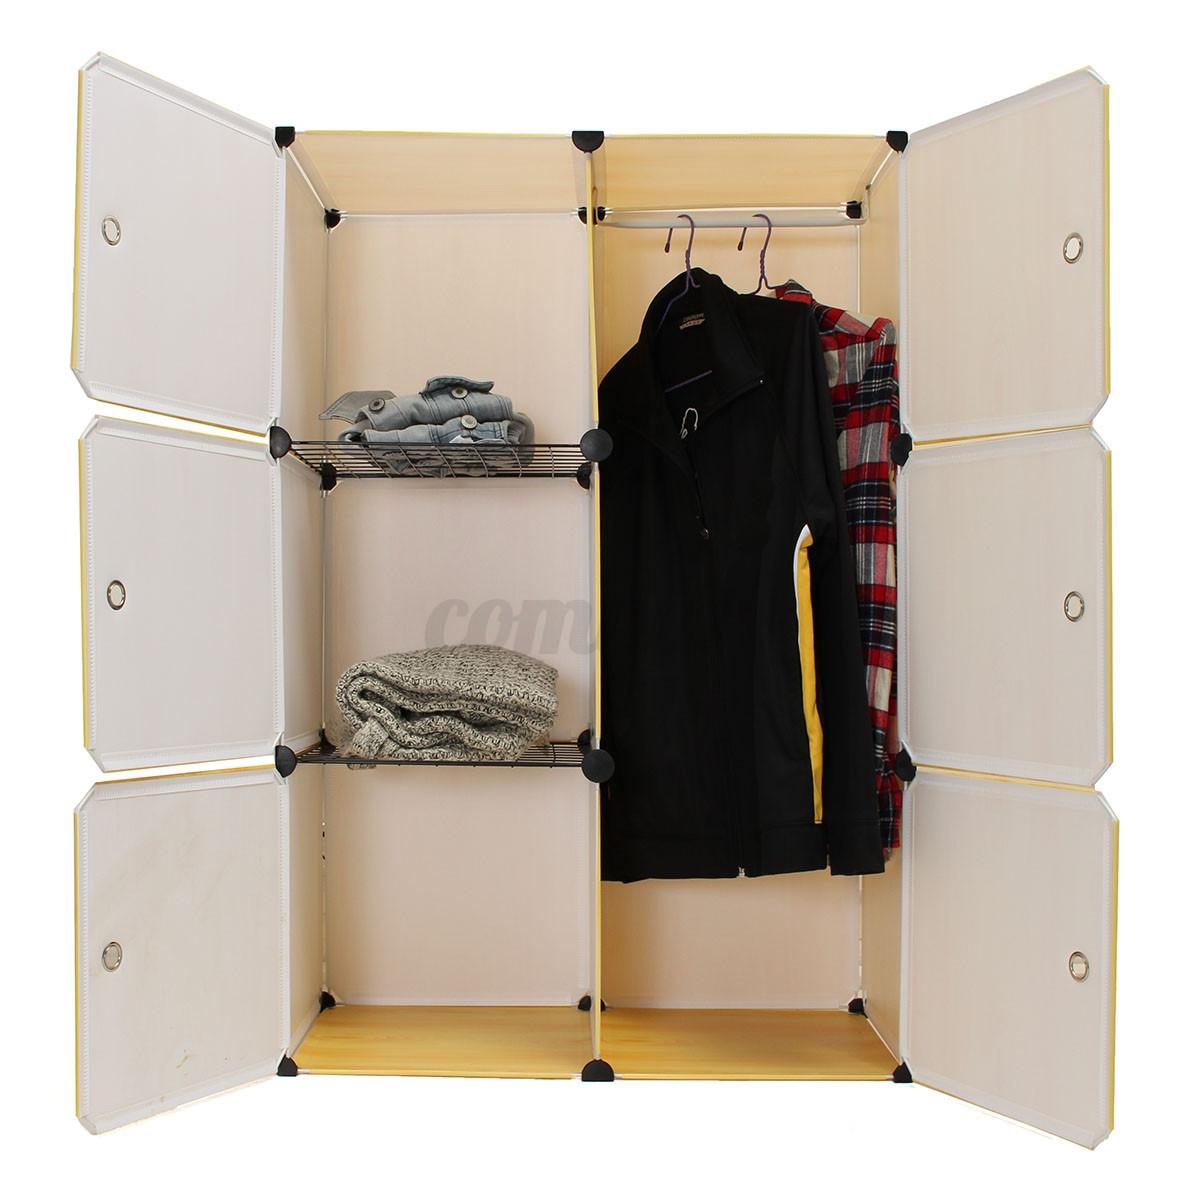 6 Cube Portable Clothes Closet Organizer Wardrobe Storage